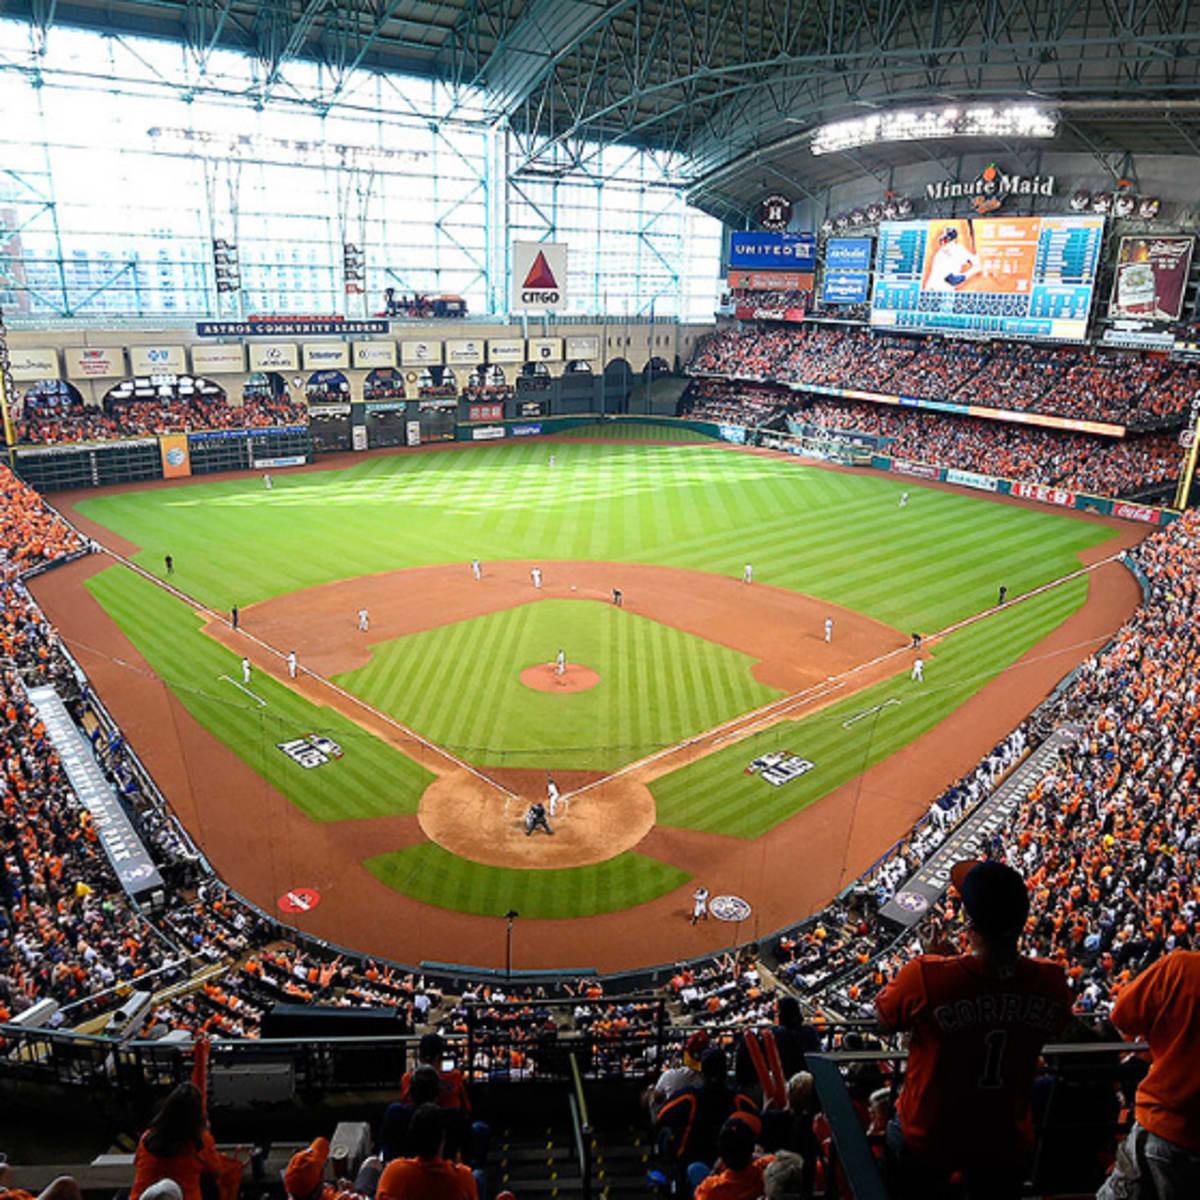 Houston, dollar hot dog night at Houston Astros, minute maid park